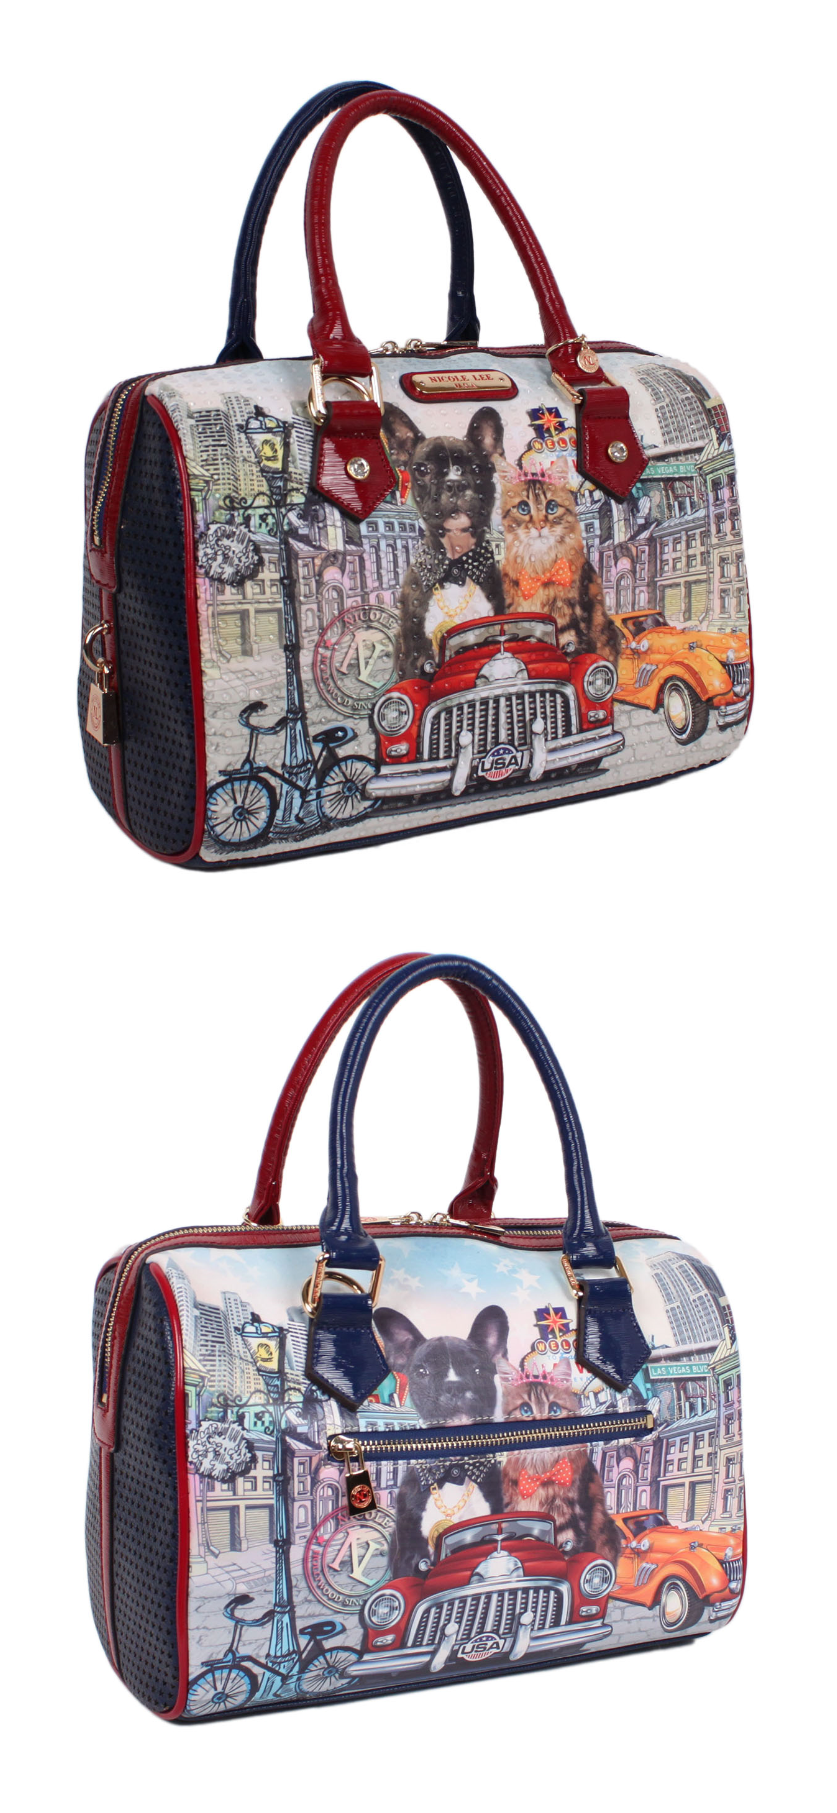 be16354ce CITY DRIVE PRINT BOSTON BAG by Nicole Lee #nicolelee #purse #bostonbag  #handbag #cartera #NL